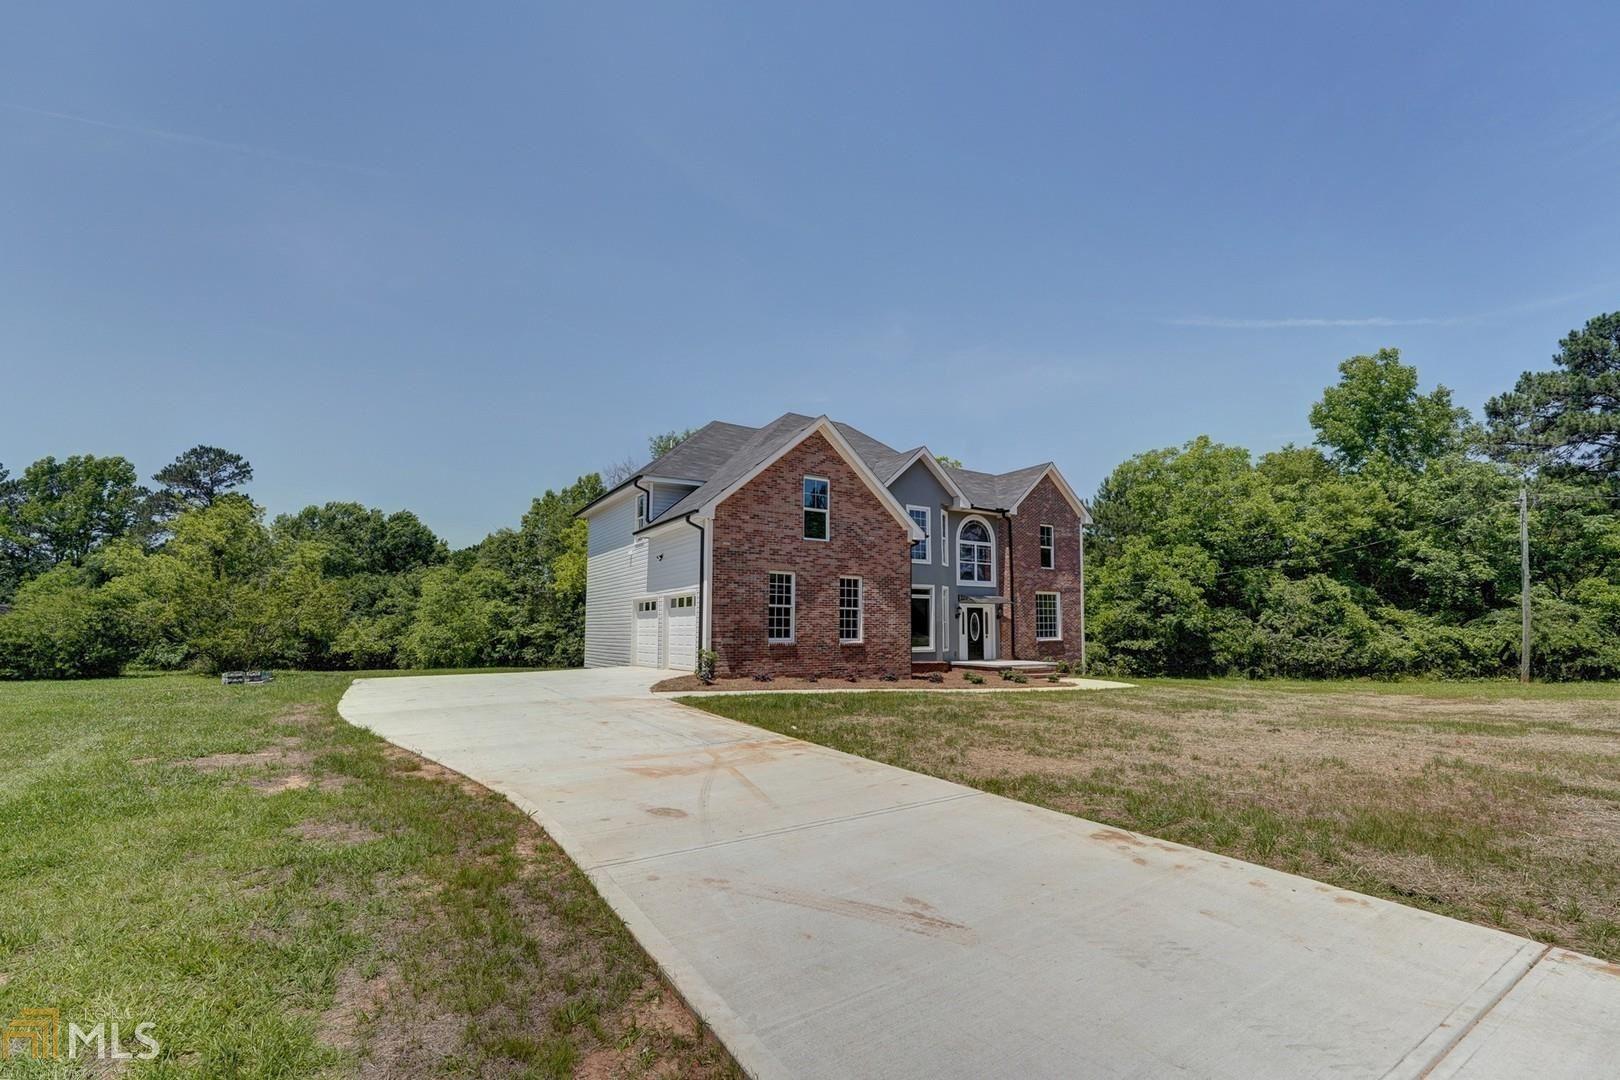 892 Perimeter Rd, Monticello, GA 31064 - MLS#: 8947268